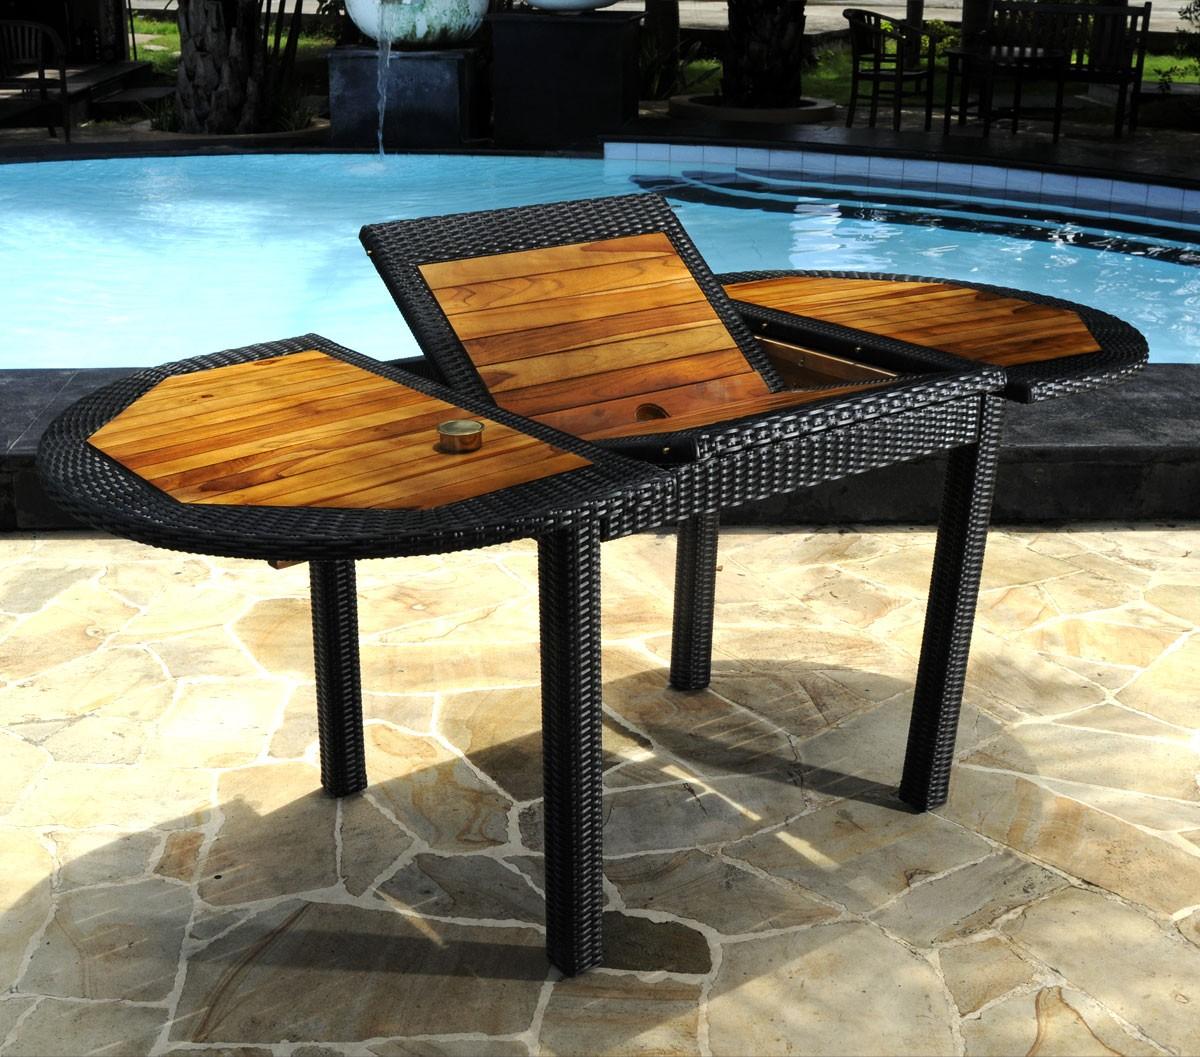 table de jardin en teck en r sine tress e tr s tendance. Black Bedroom Furniture Sets. Home Design Ideas